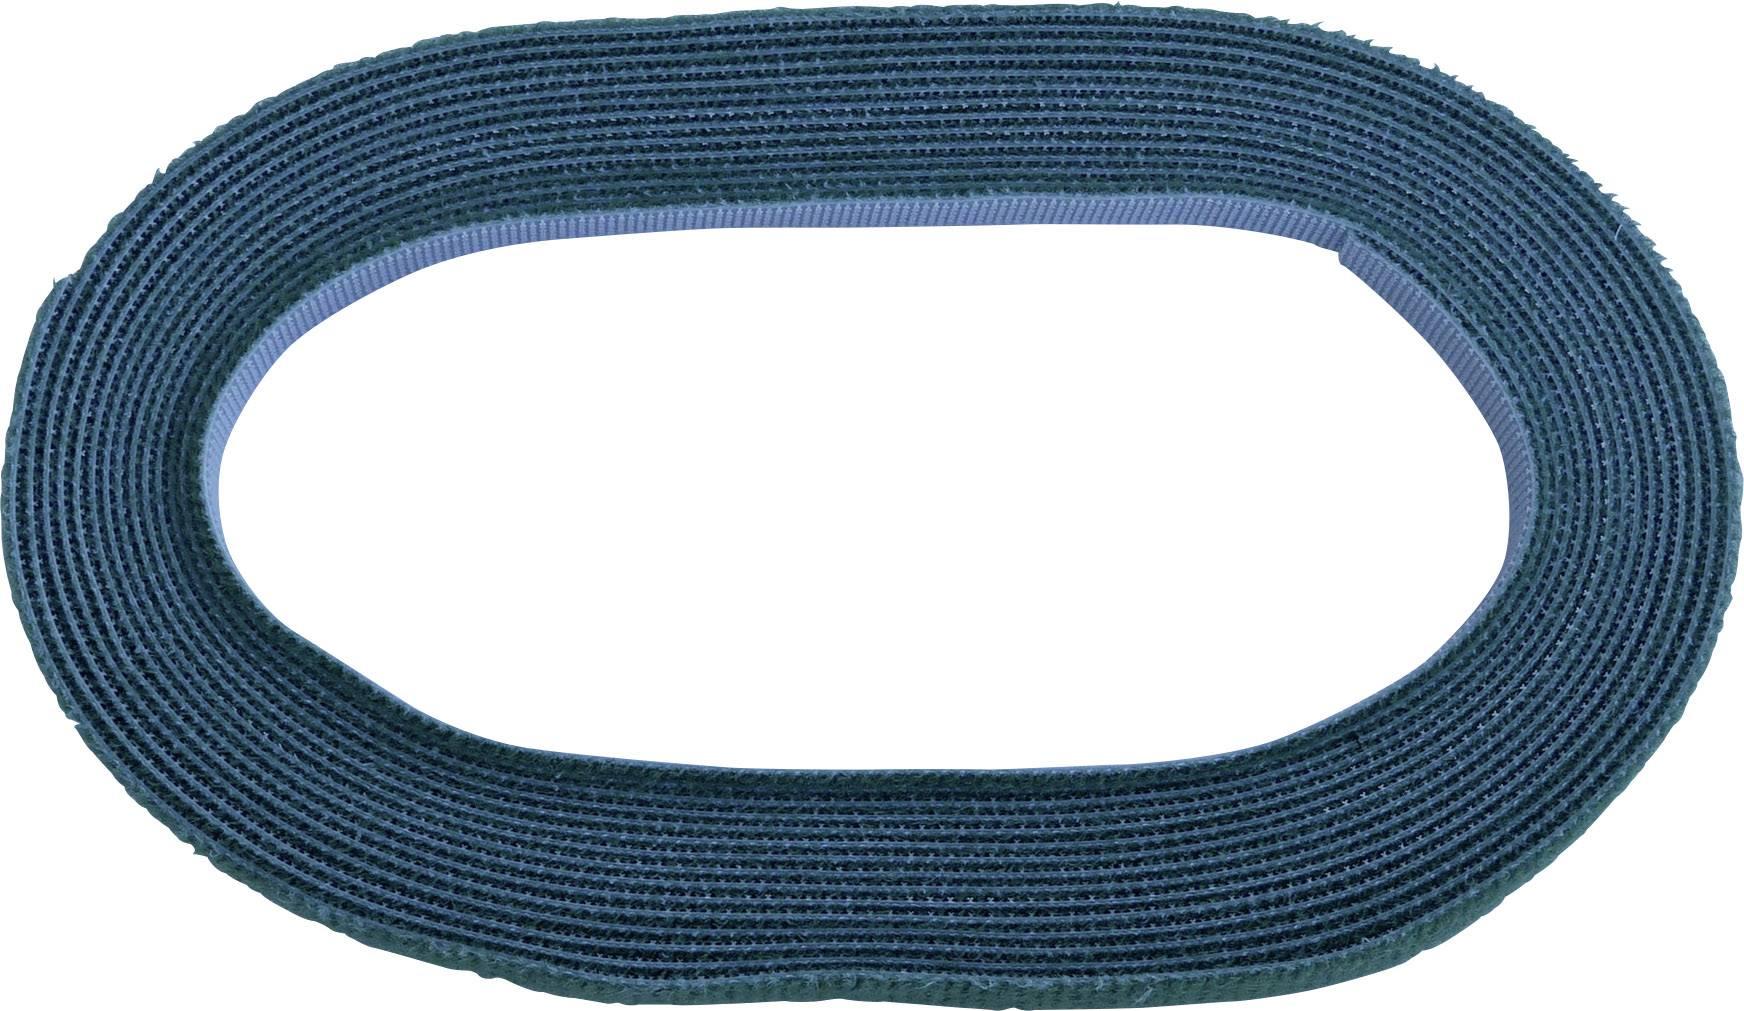 Pásek se suchým zipem TRU COMPONENTS 696-650-Bag, (d x š) 5000 mm x 10 mm, zelená, 5 m